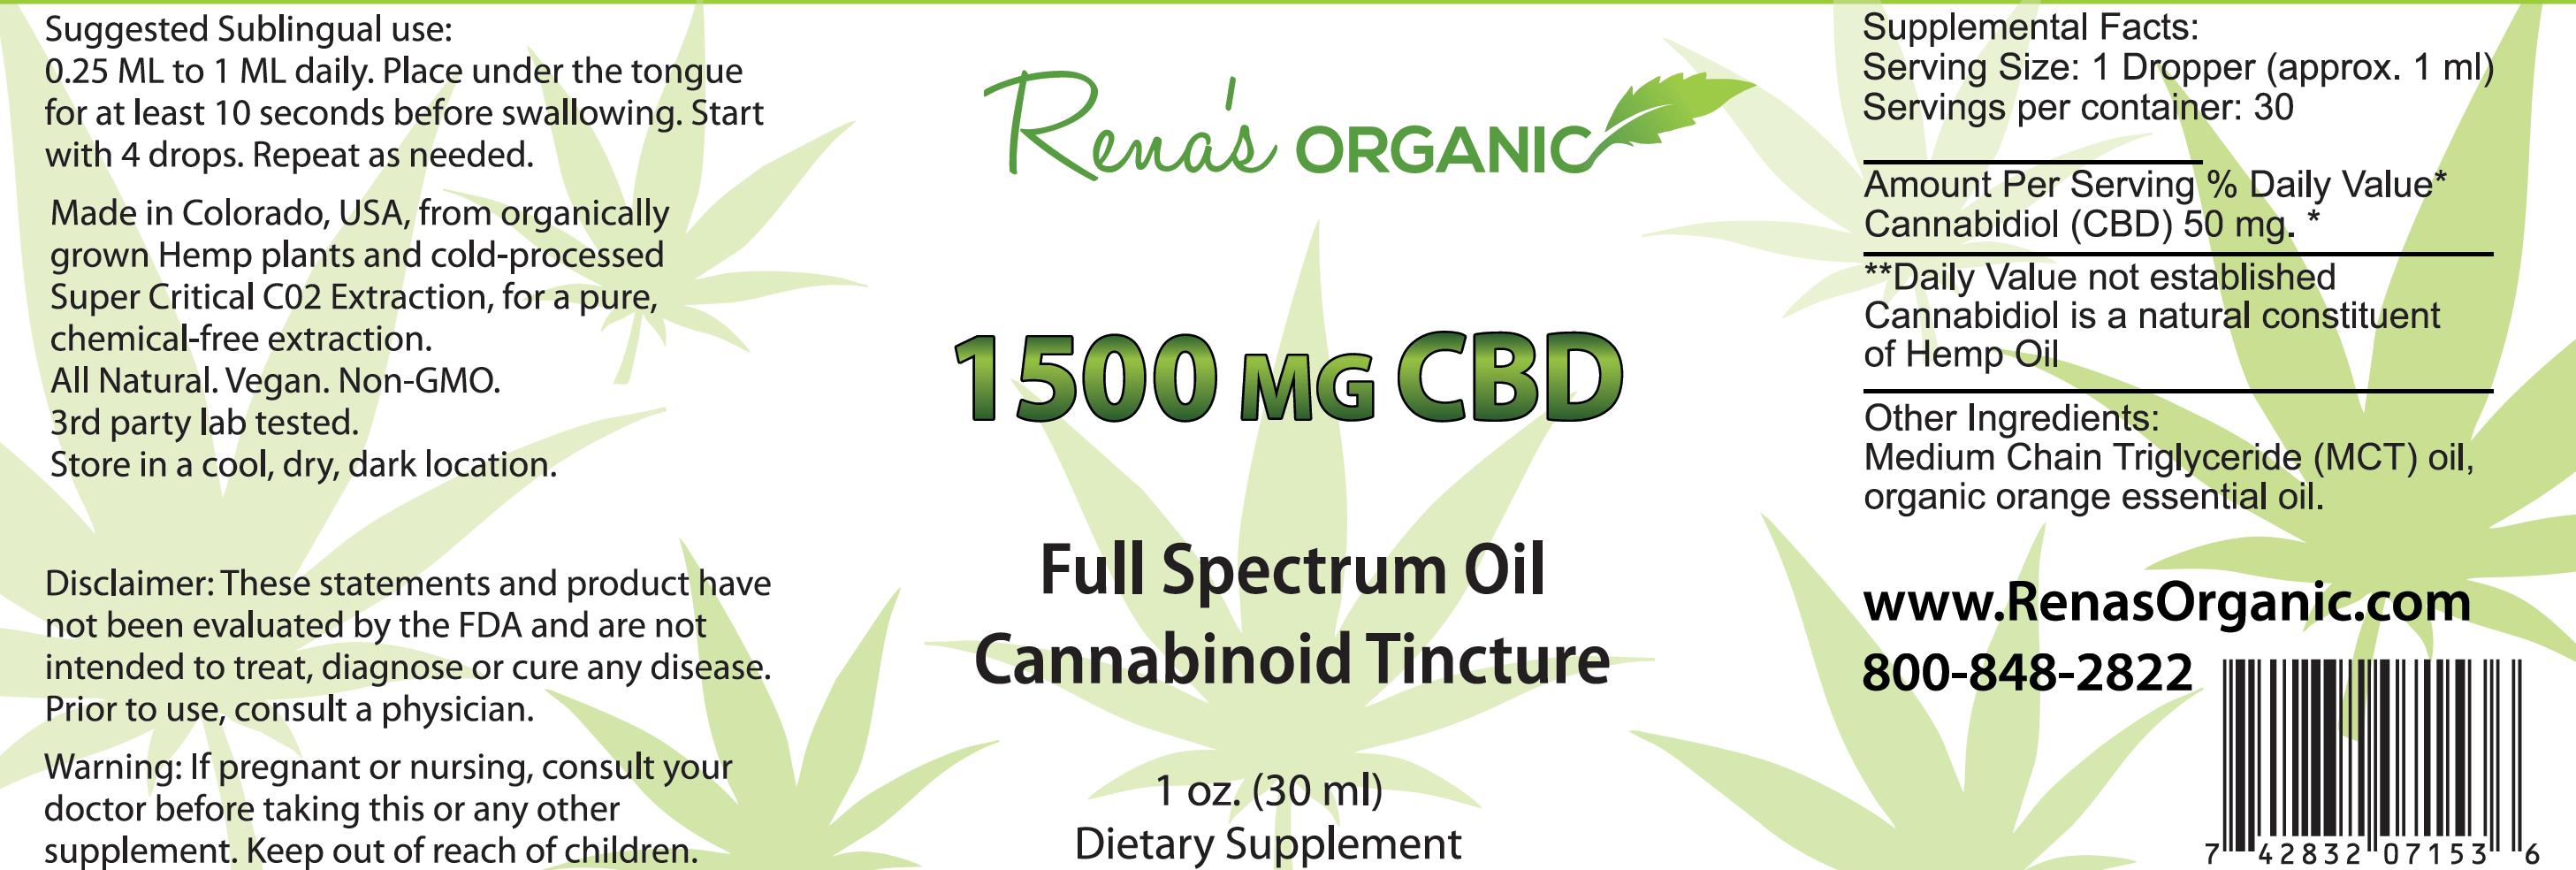 1500 mg CBD tincture